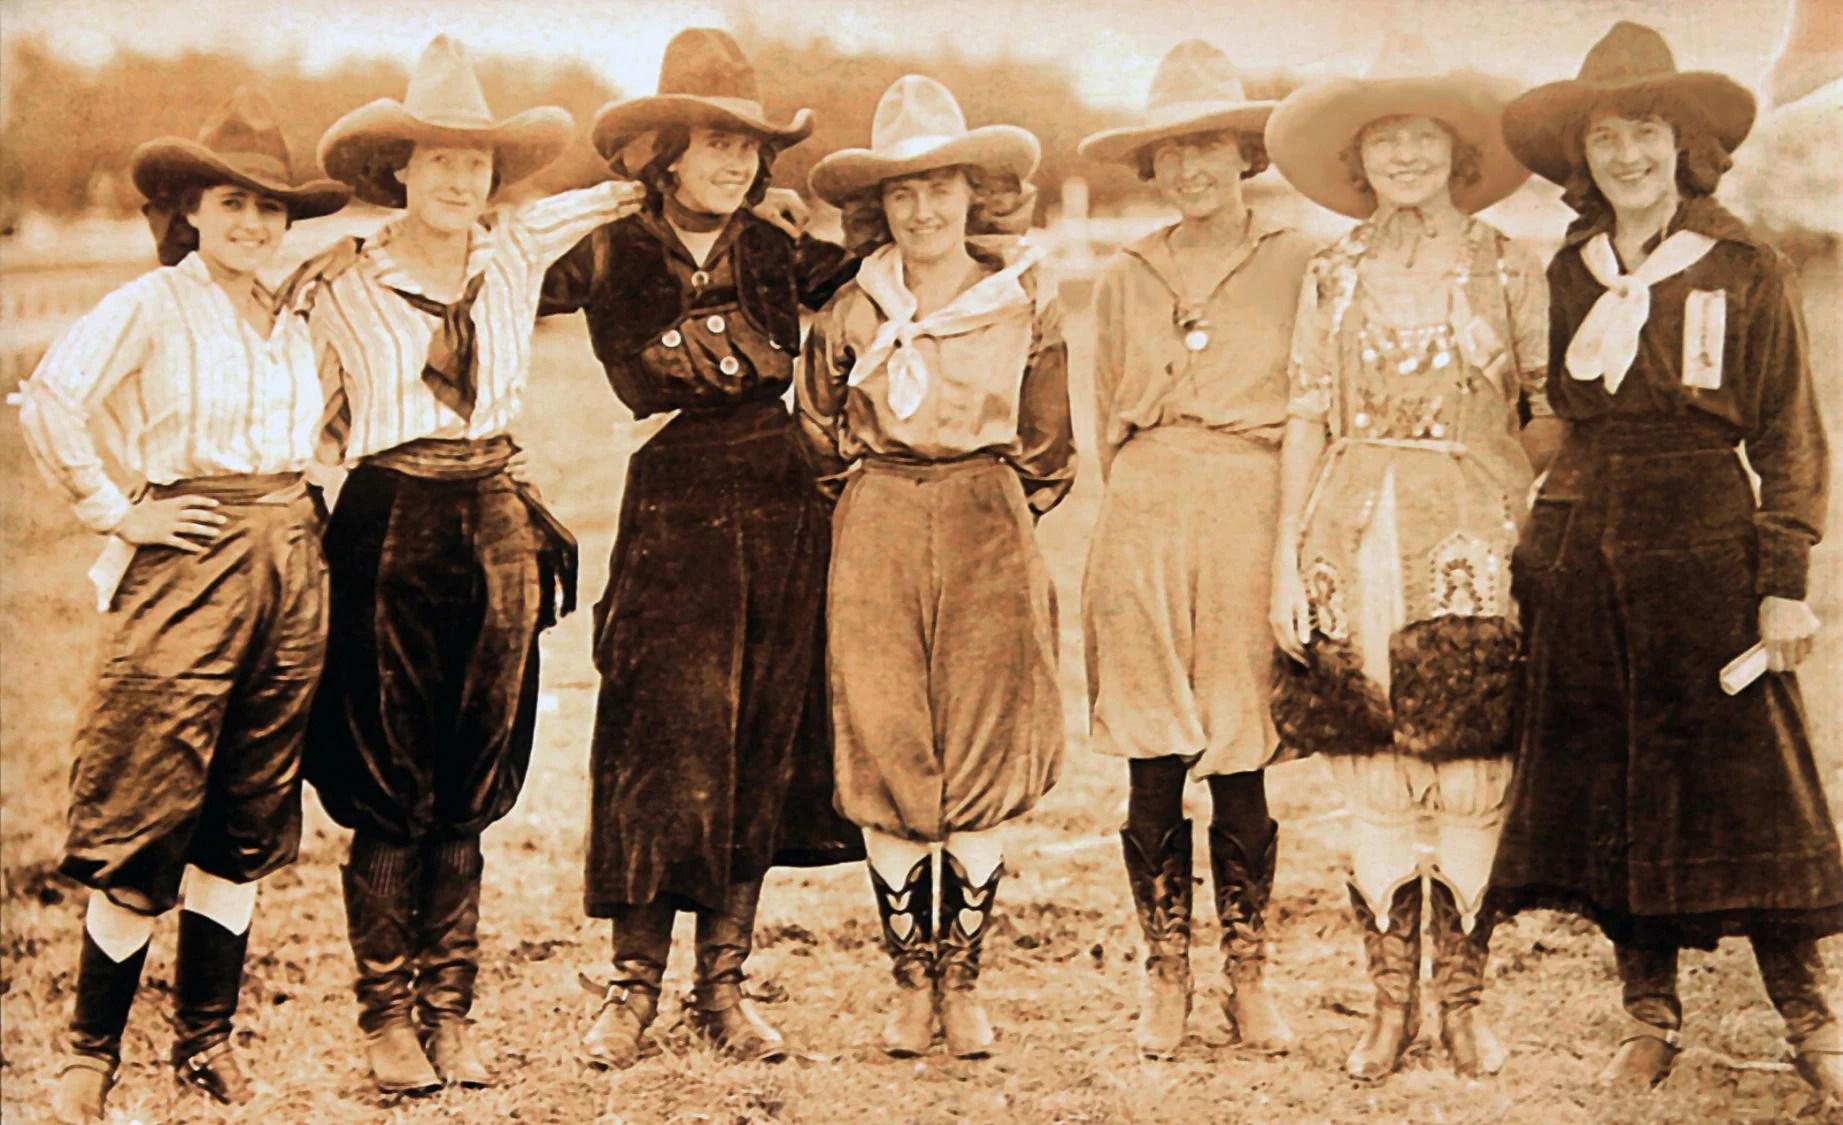 Cowgirls' glory days on exhibit